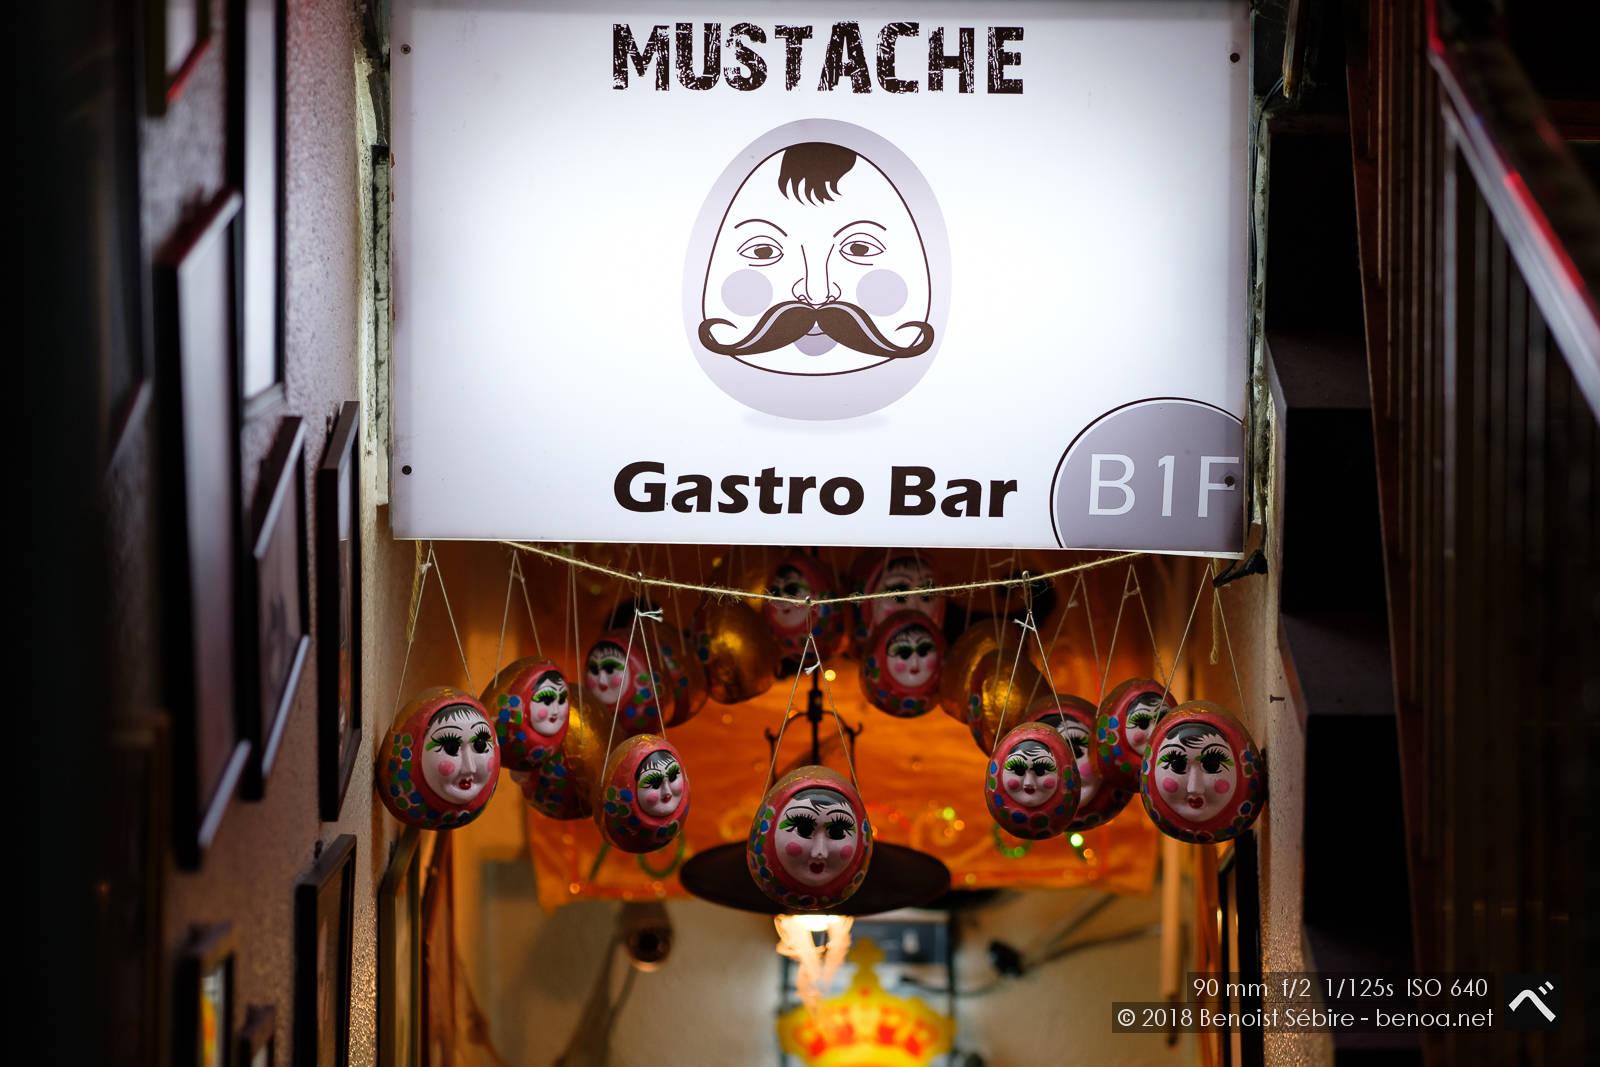 Gastro Bar